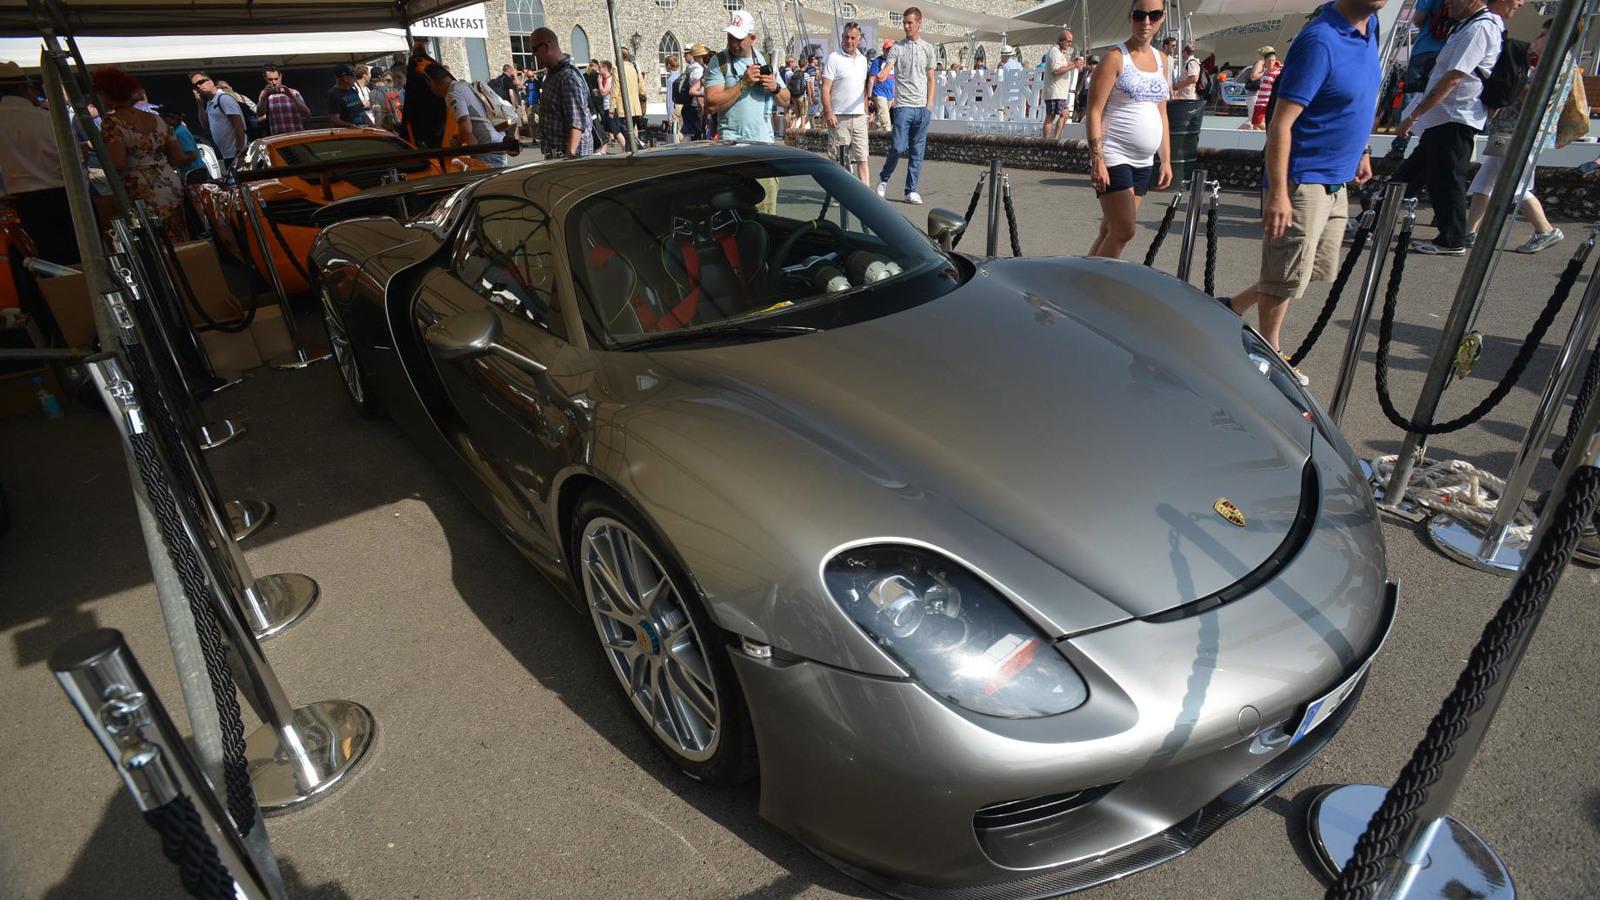 Porsche 918 Spyder at the 2013 Goodwood Festival of Speed